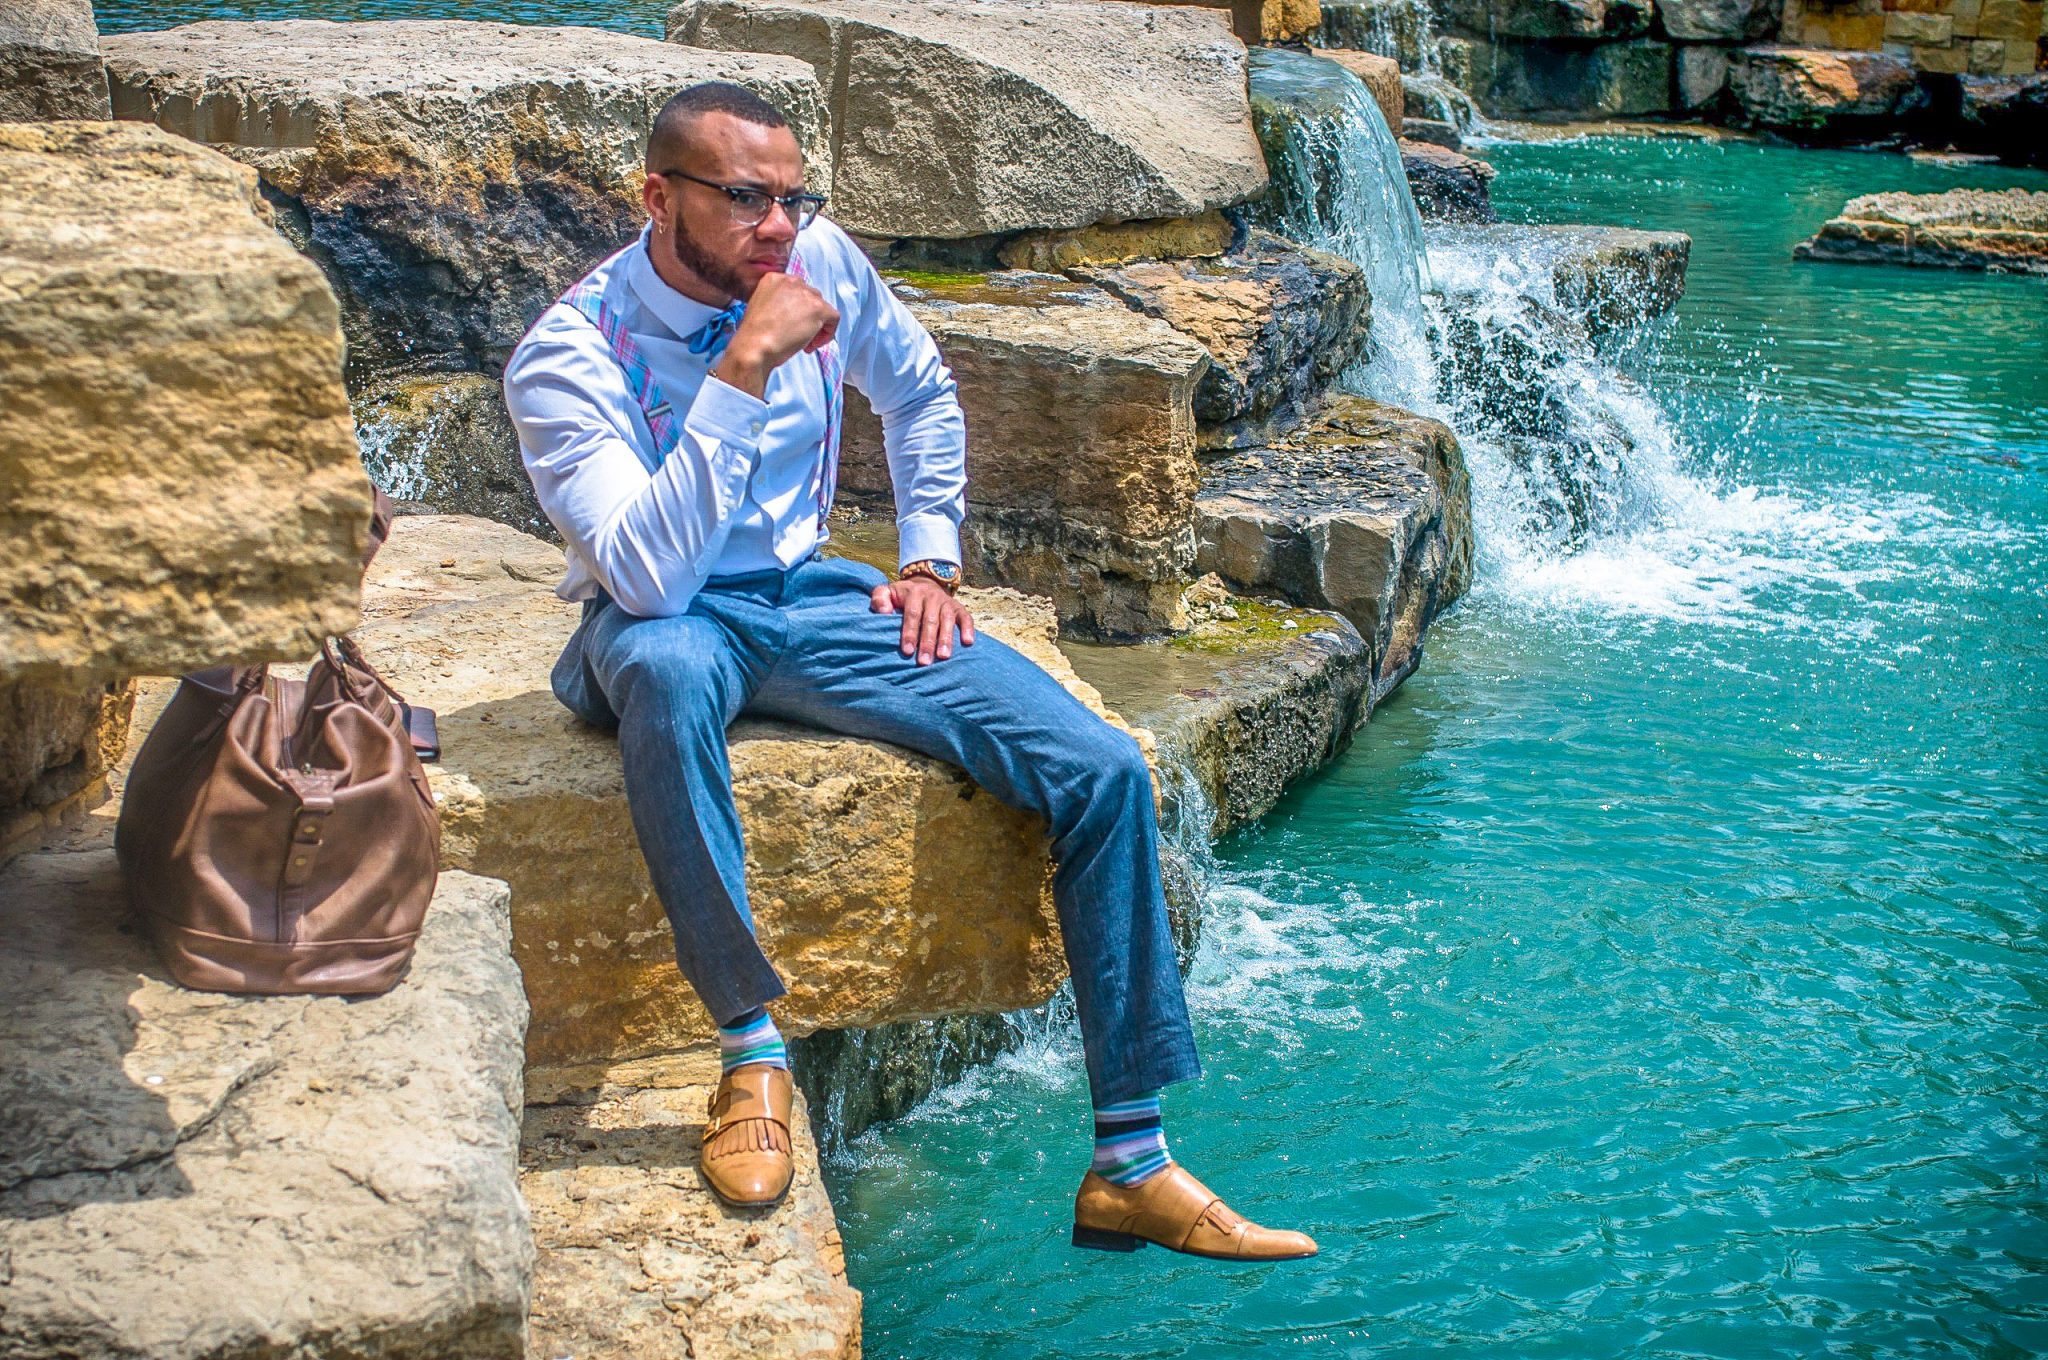 Young Entrepreneur Spotlight: Eric Jones of LFLS Shoes